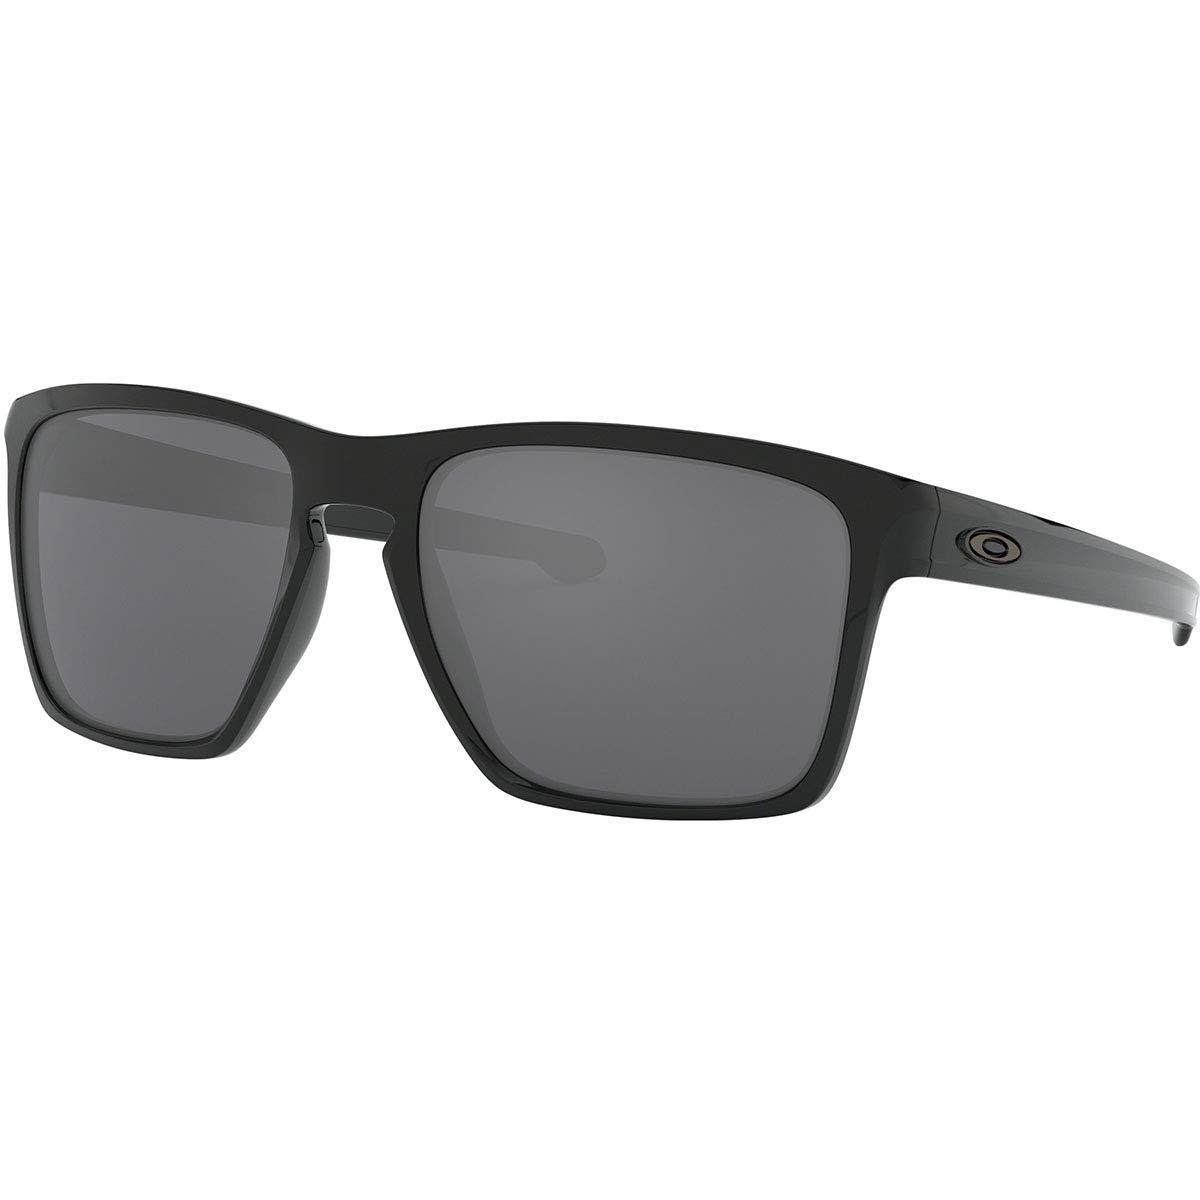 Oakley Men's OO9341 Sliver XL Rectangular Sunglasses, Polished Black/Black Iridium, 57 mm by Oakley